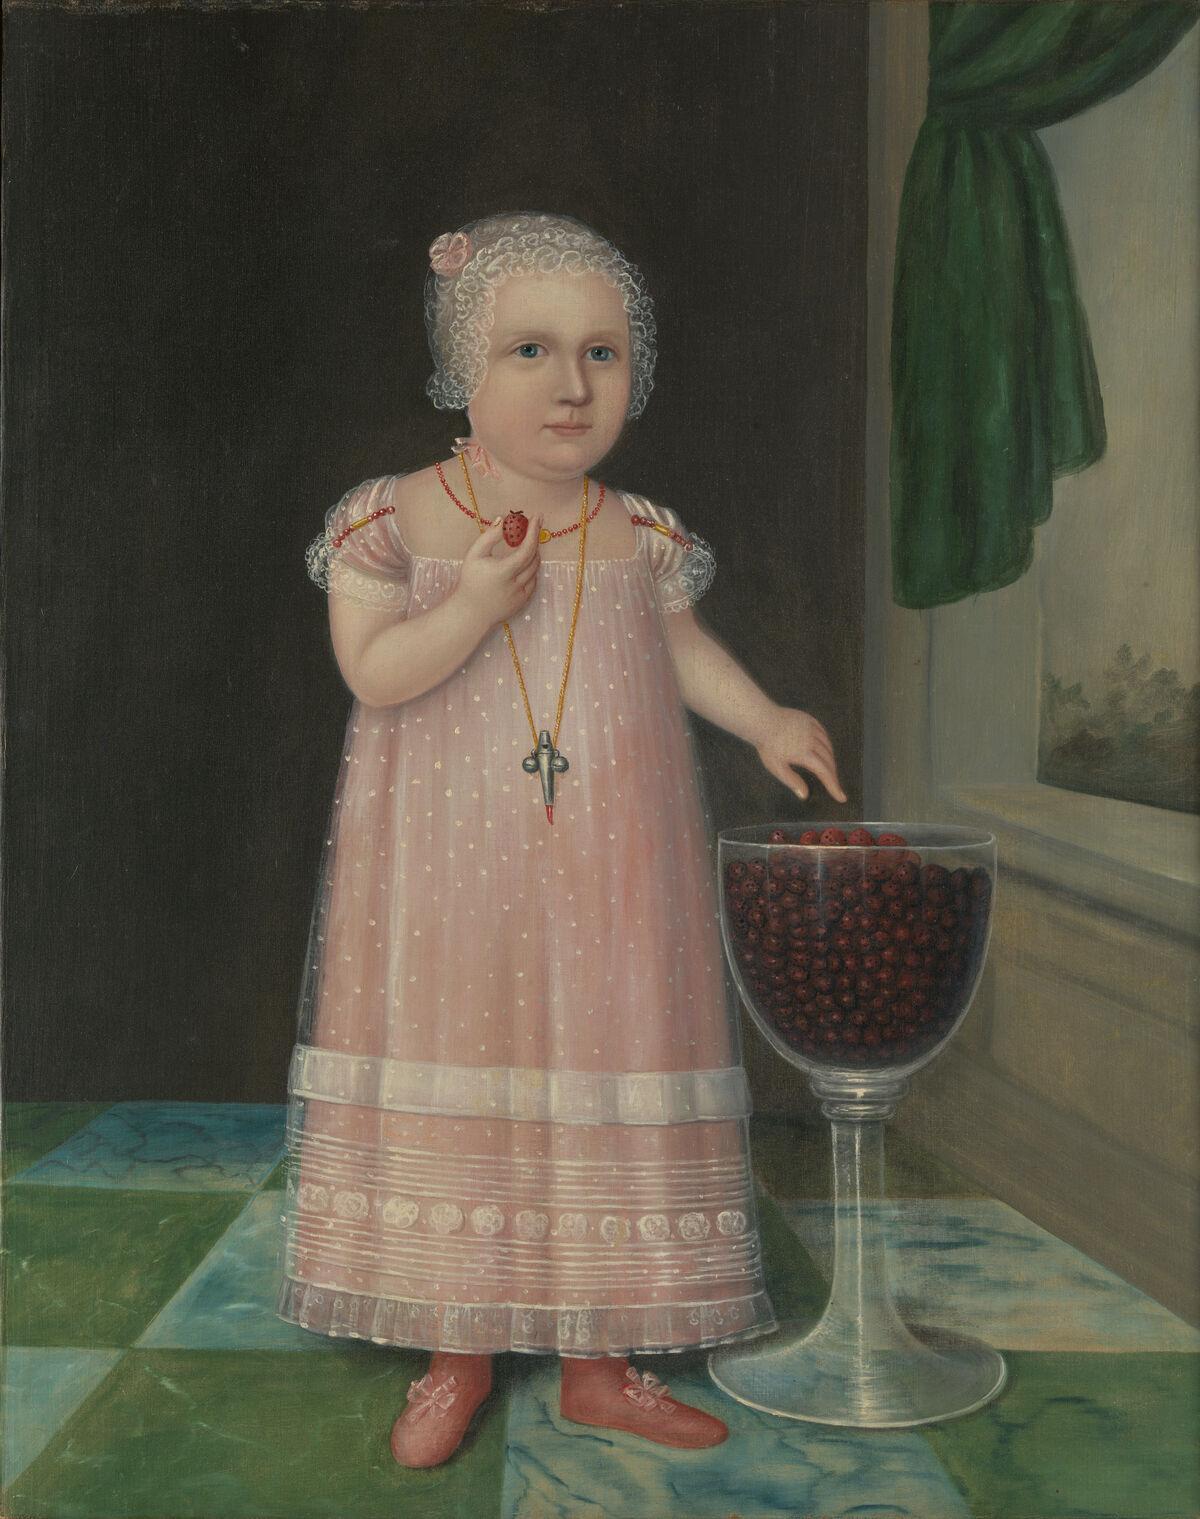 Joshua Johnson, Emma Van Name, c. 1805. Courtesy of Metropolitan Museum of Art.